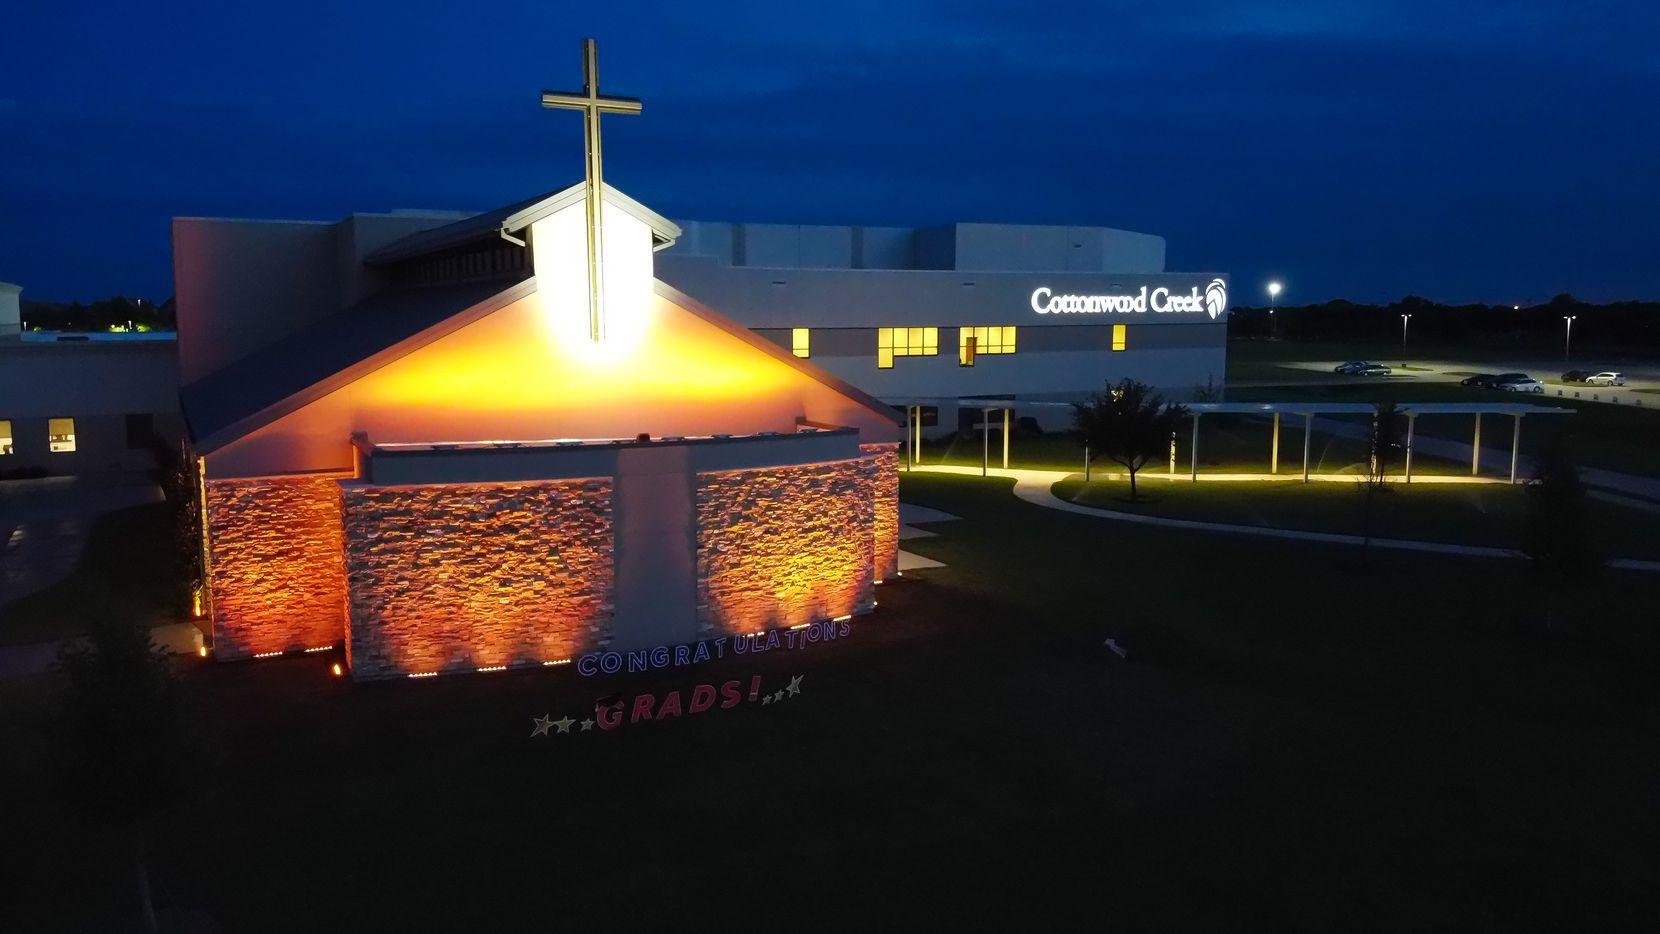 Cottonwood Creek Church was lit up gold May 27, 2020, to honor graduating seniors.